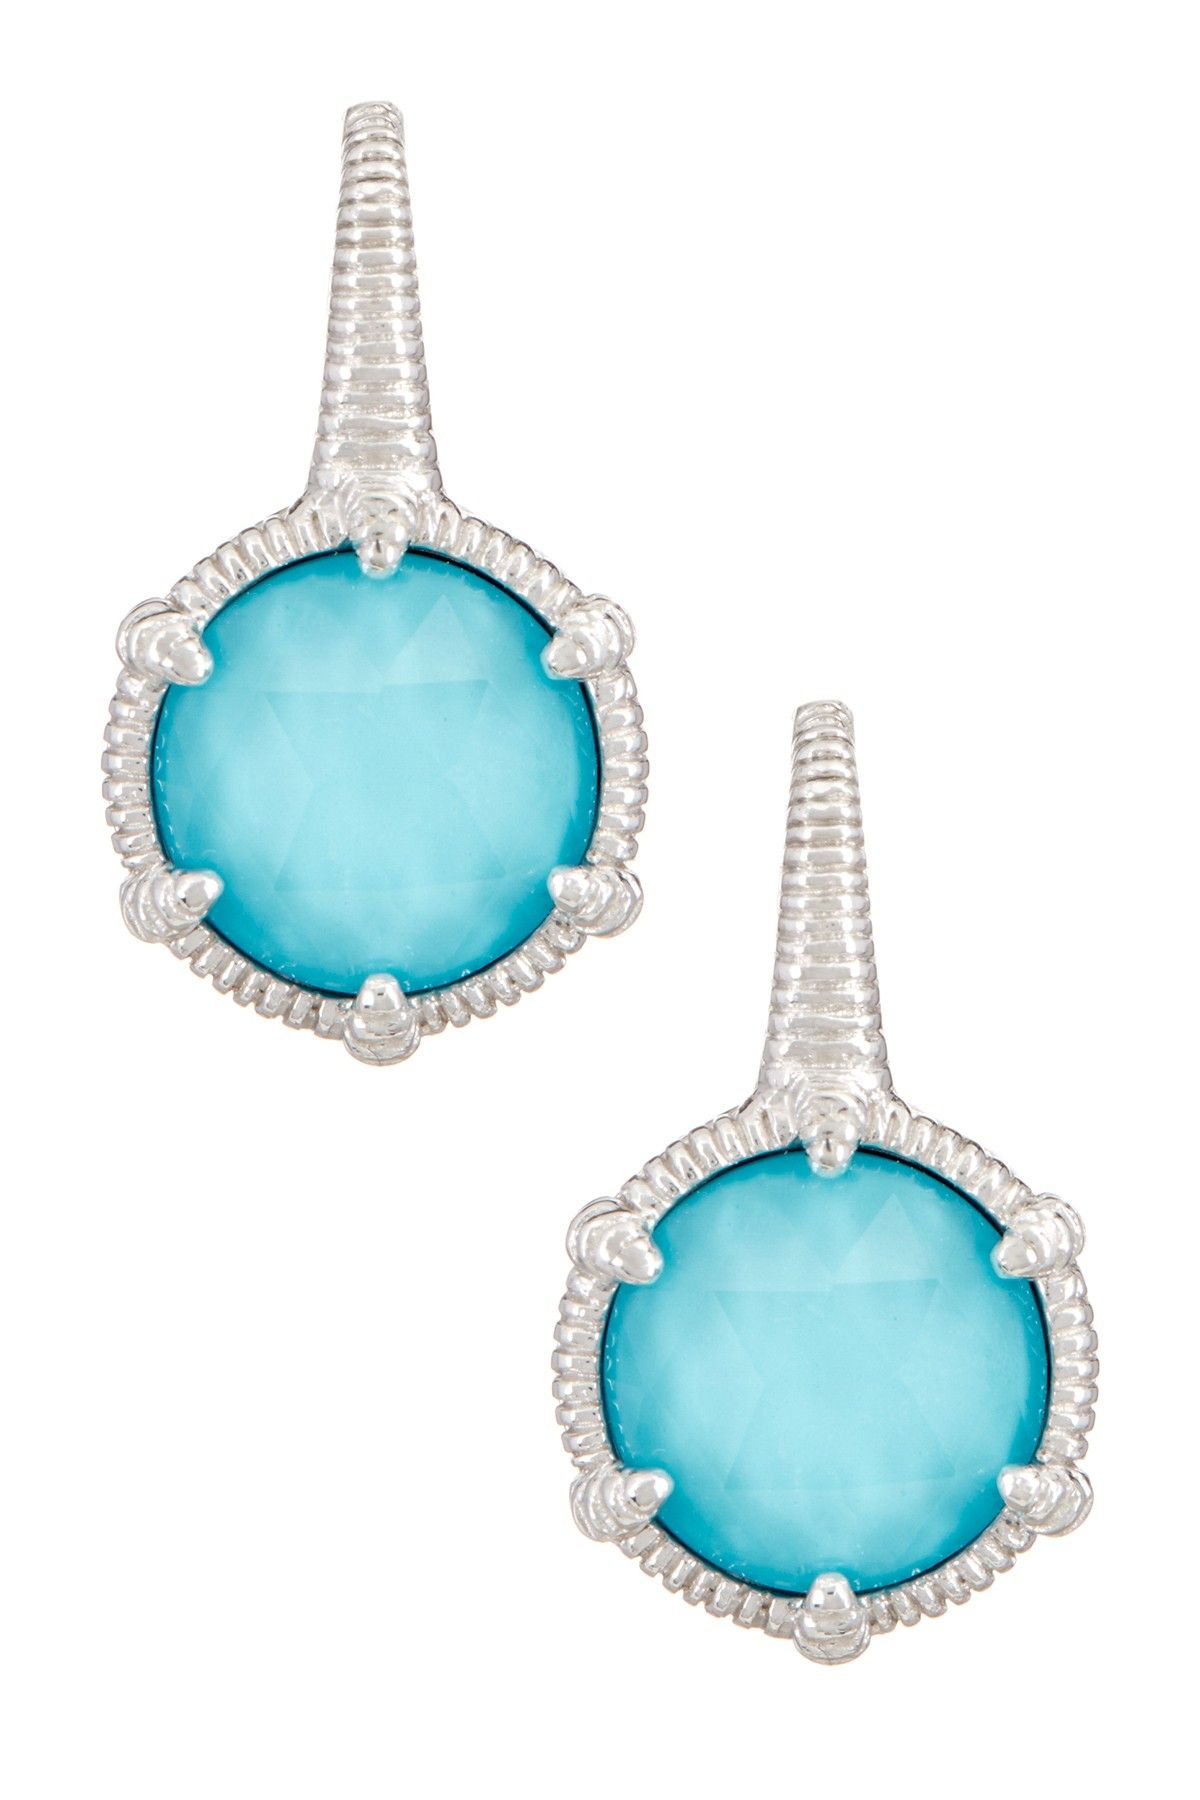 6c24062ed Judith Ripka | Eclipse Round Turquoise Doublet Earrings | Nordstrom Rack …